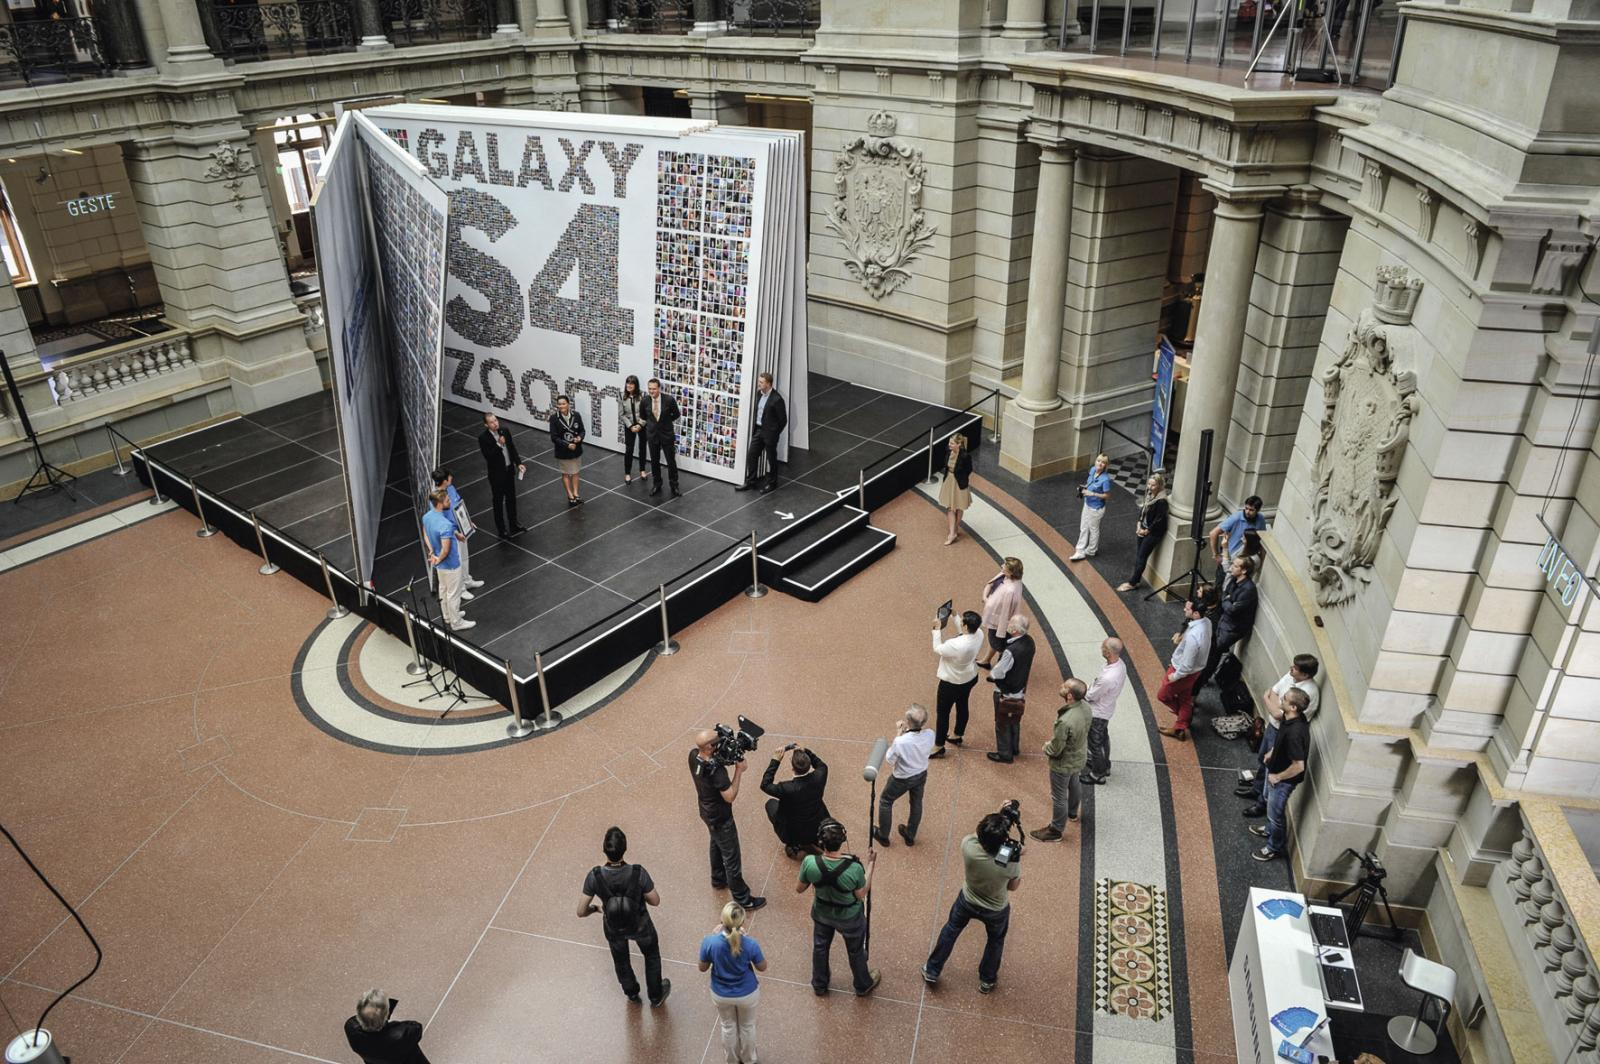 Samsung größtes Fotobuch der Welt - Weltrekord